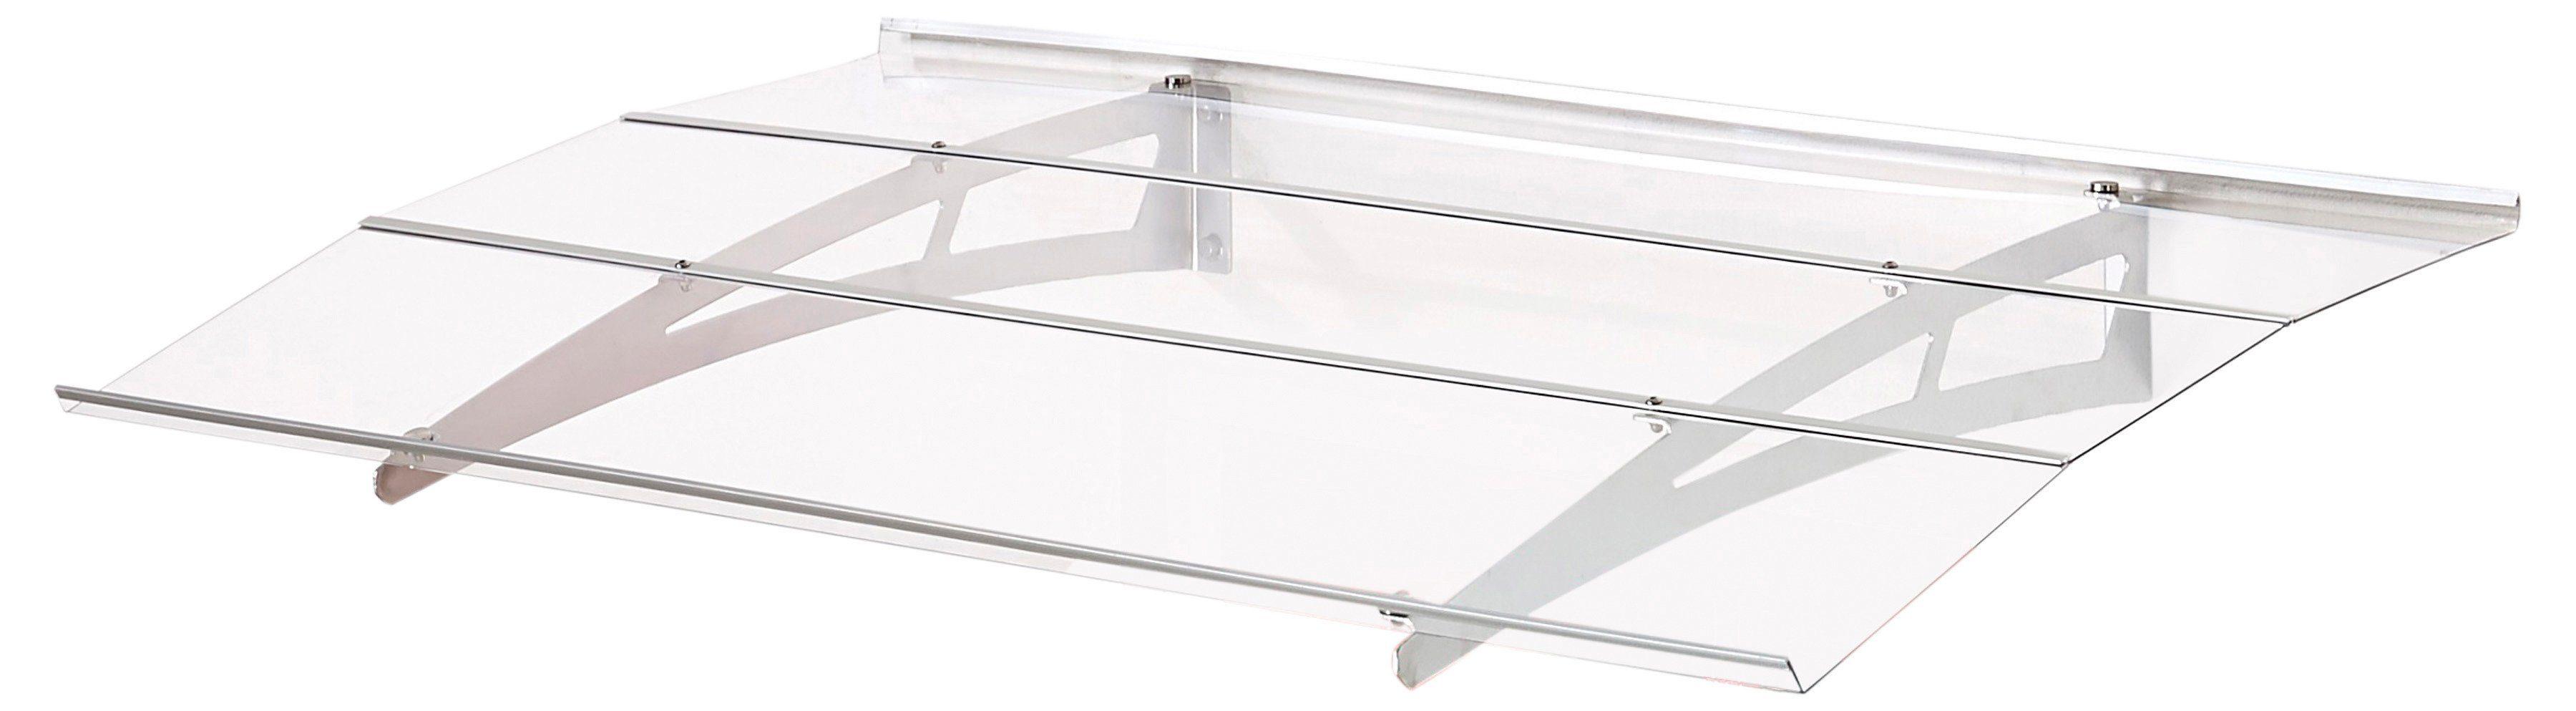 Superroof Pultvordach »Madrid 1400« B/T/H: 140/90/18 cm, silber